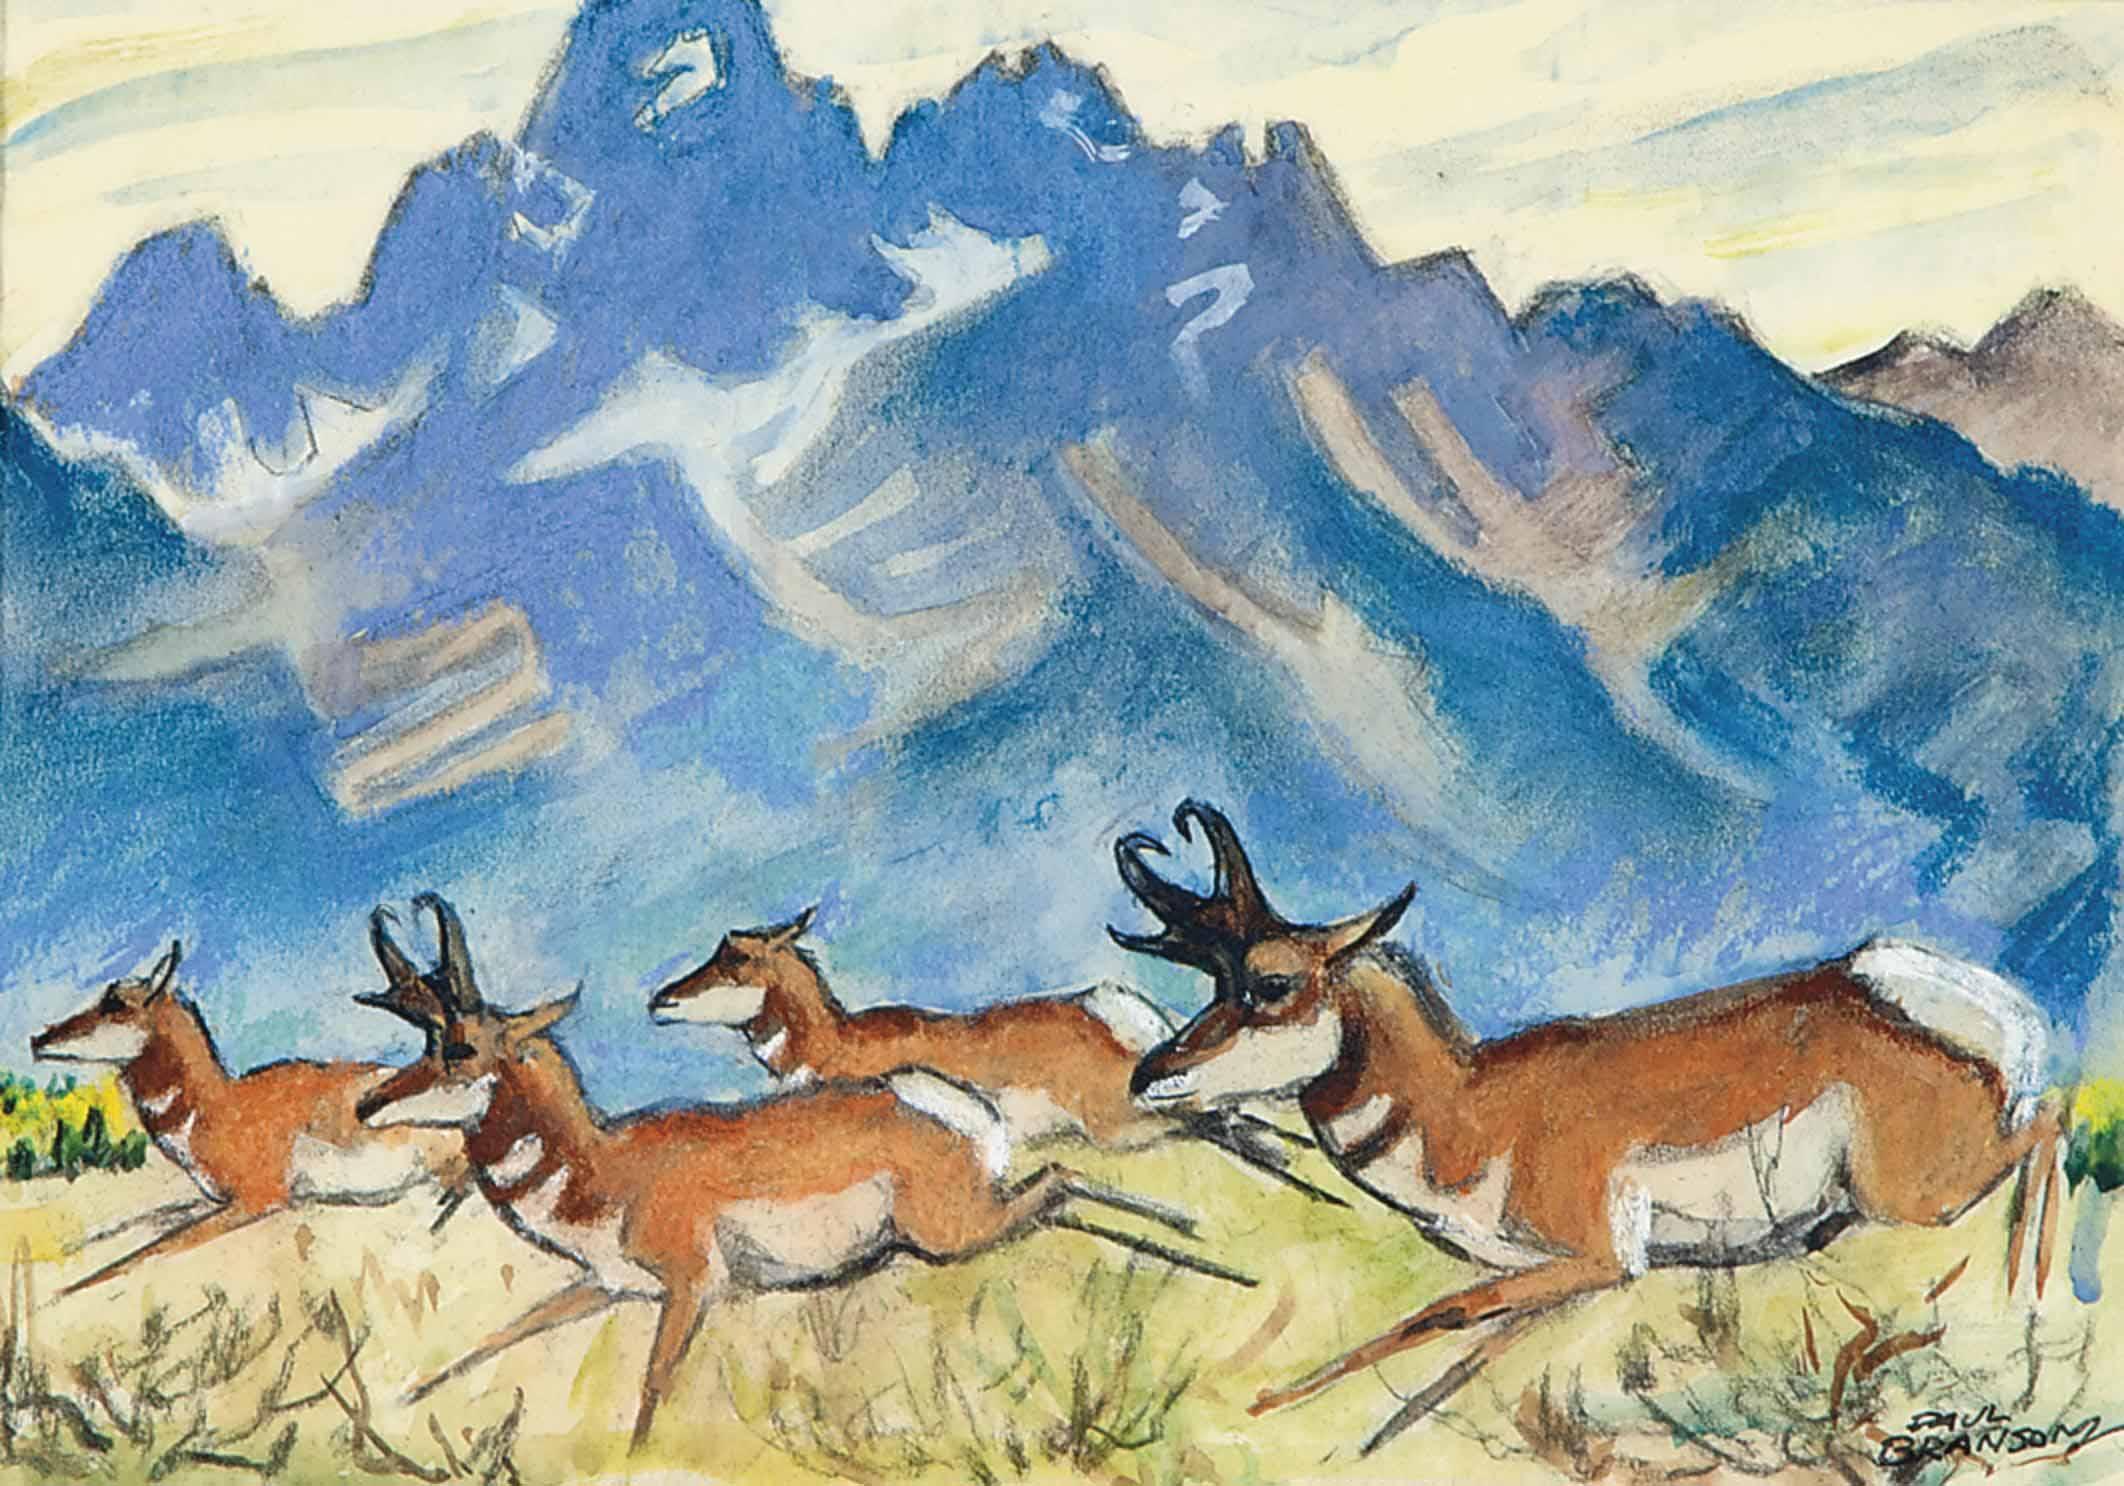 Running Antelope (Segrame Calendar Study)